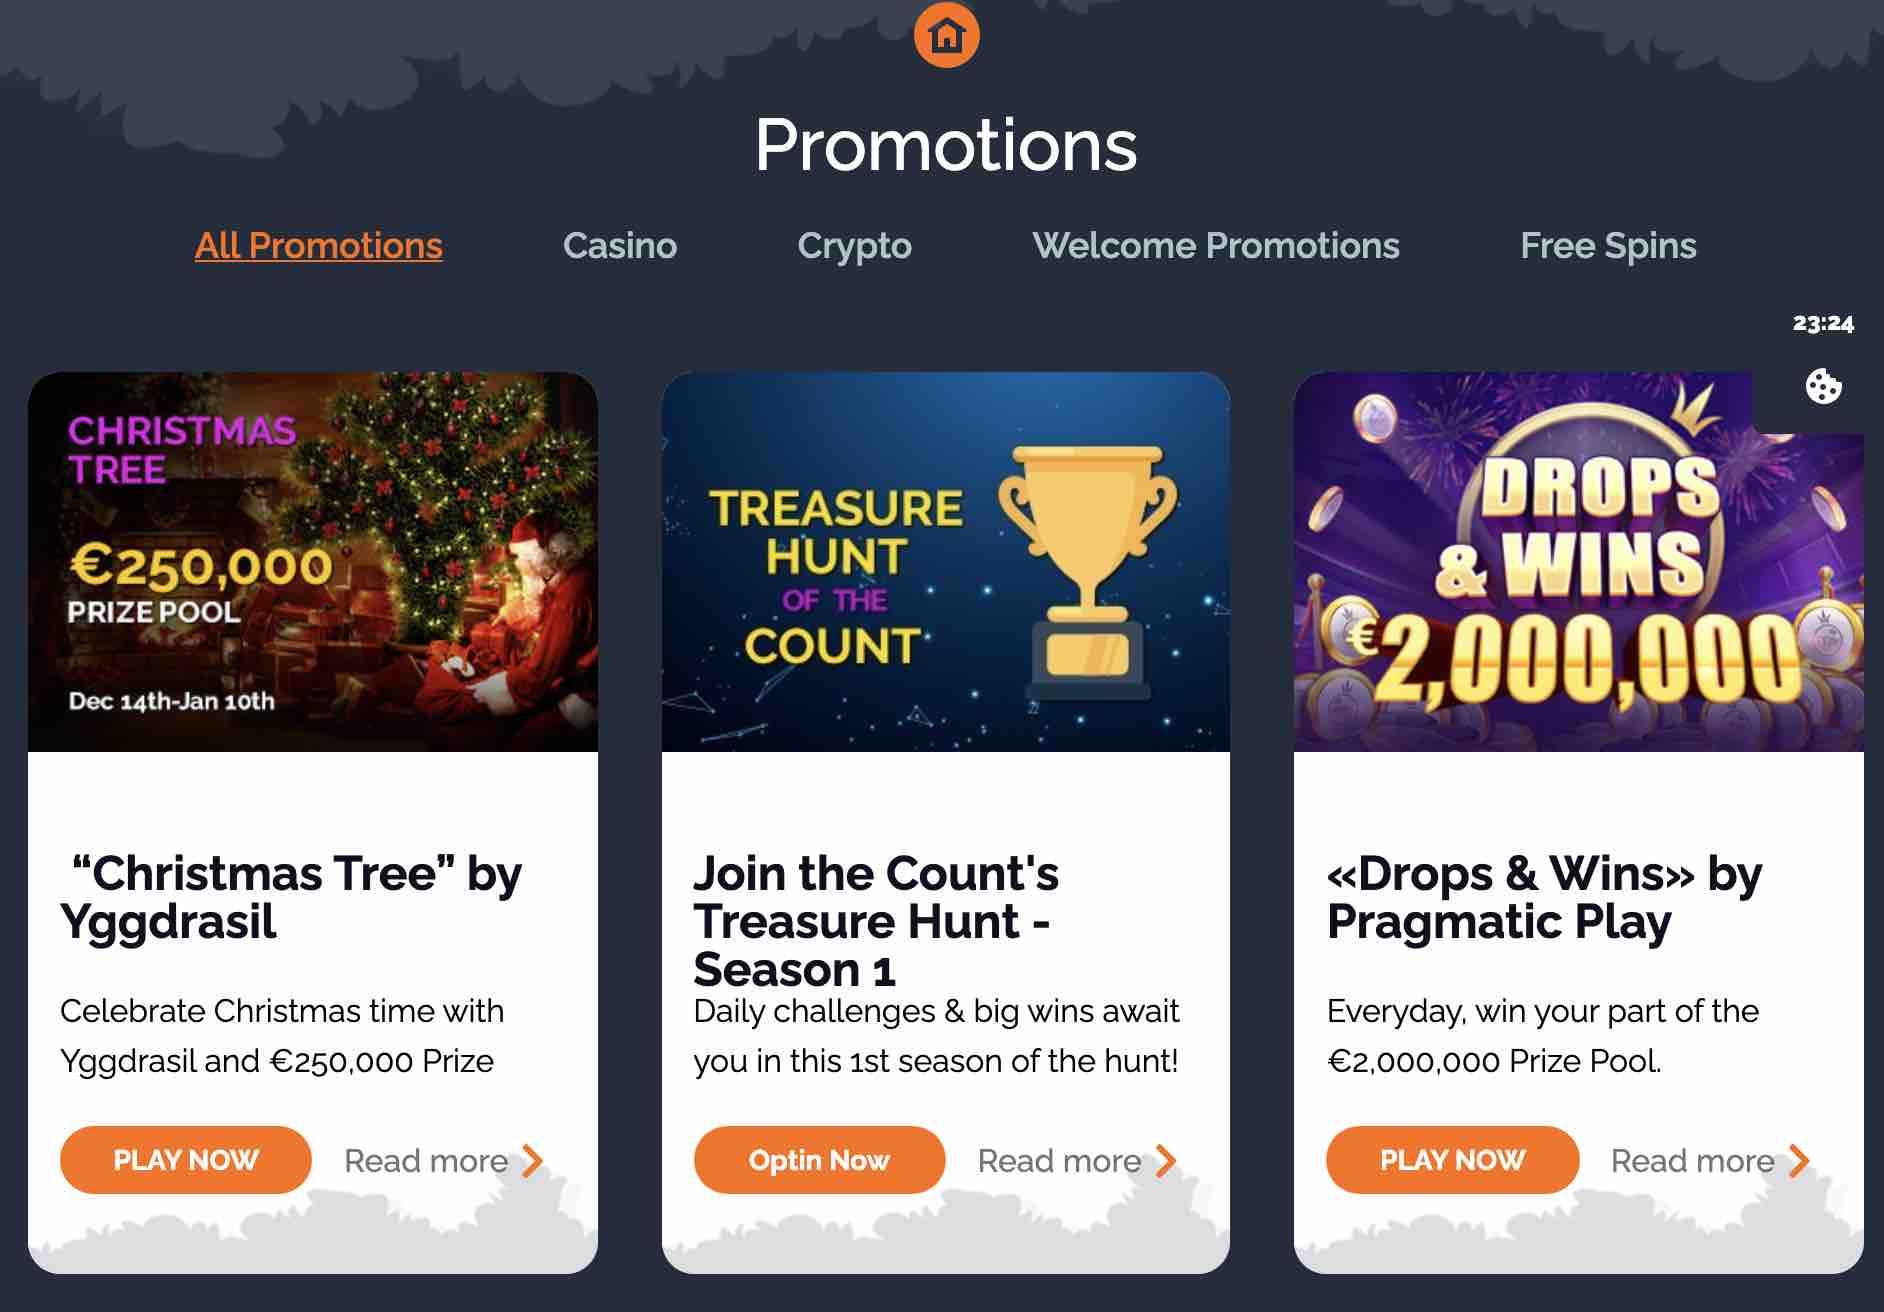 montecryptos casino offers and bonuses